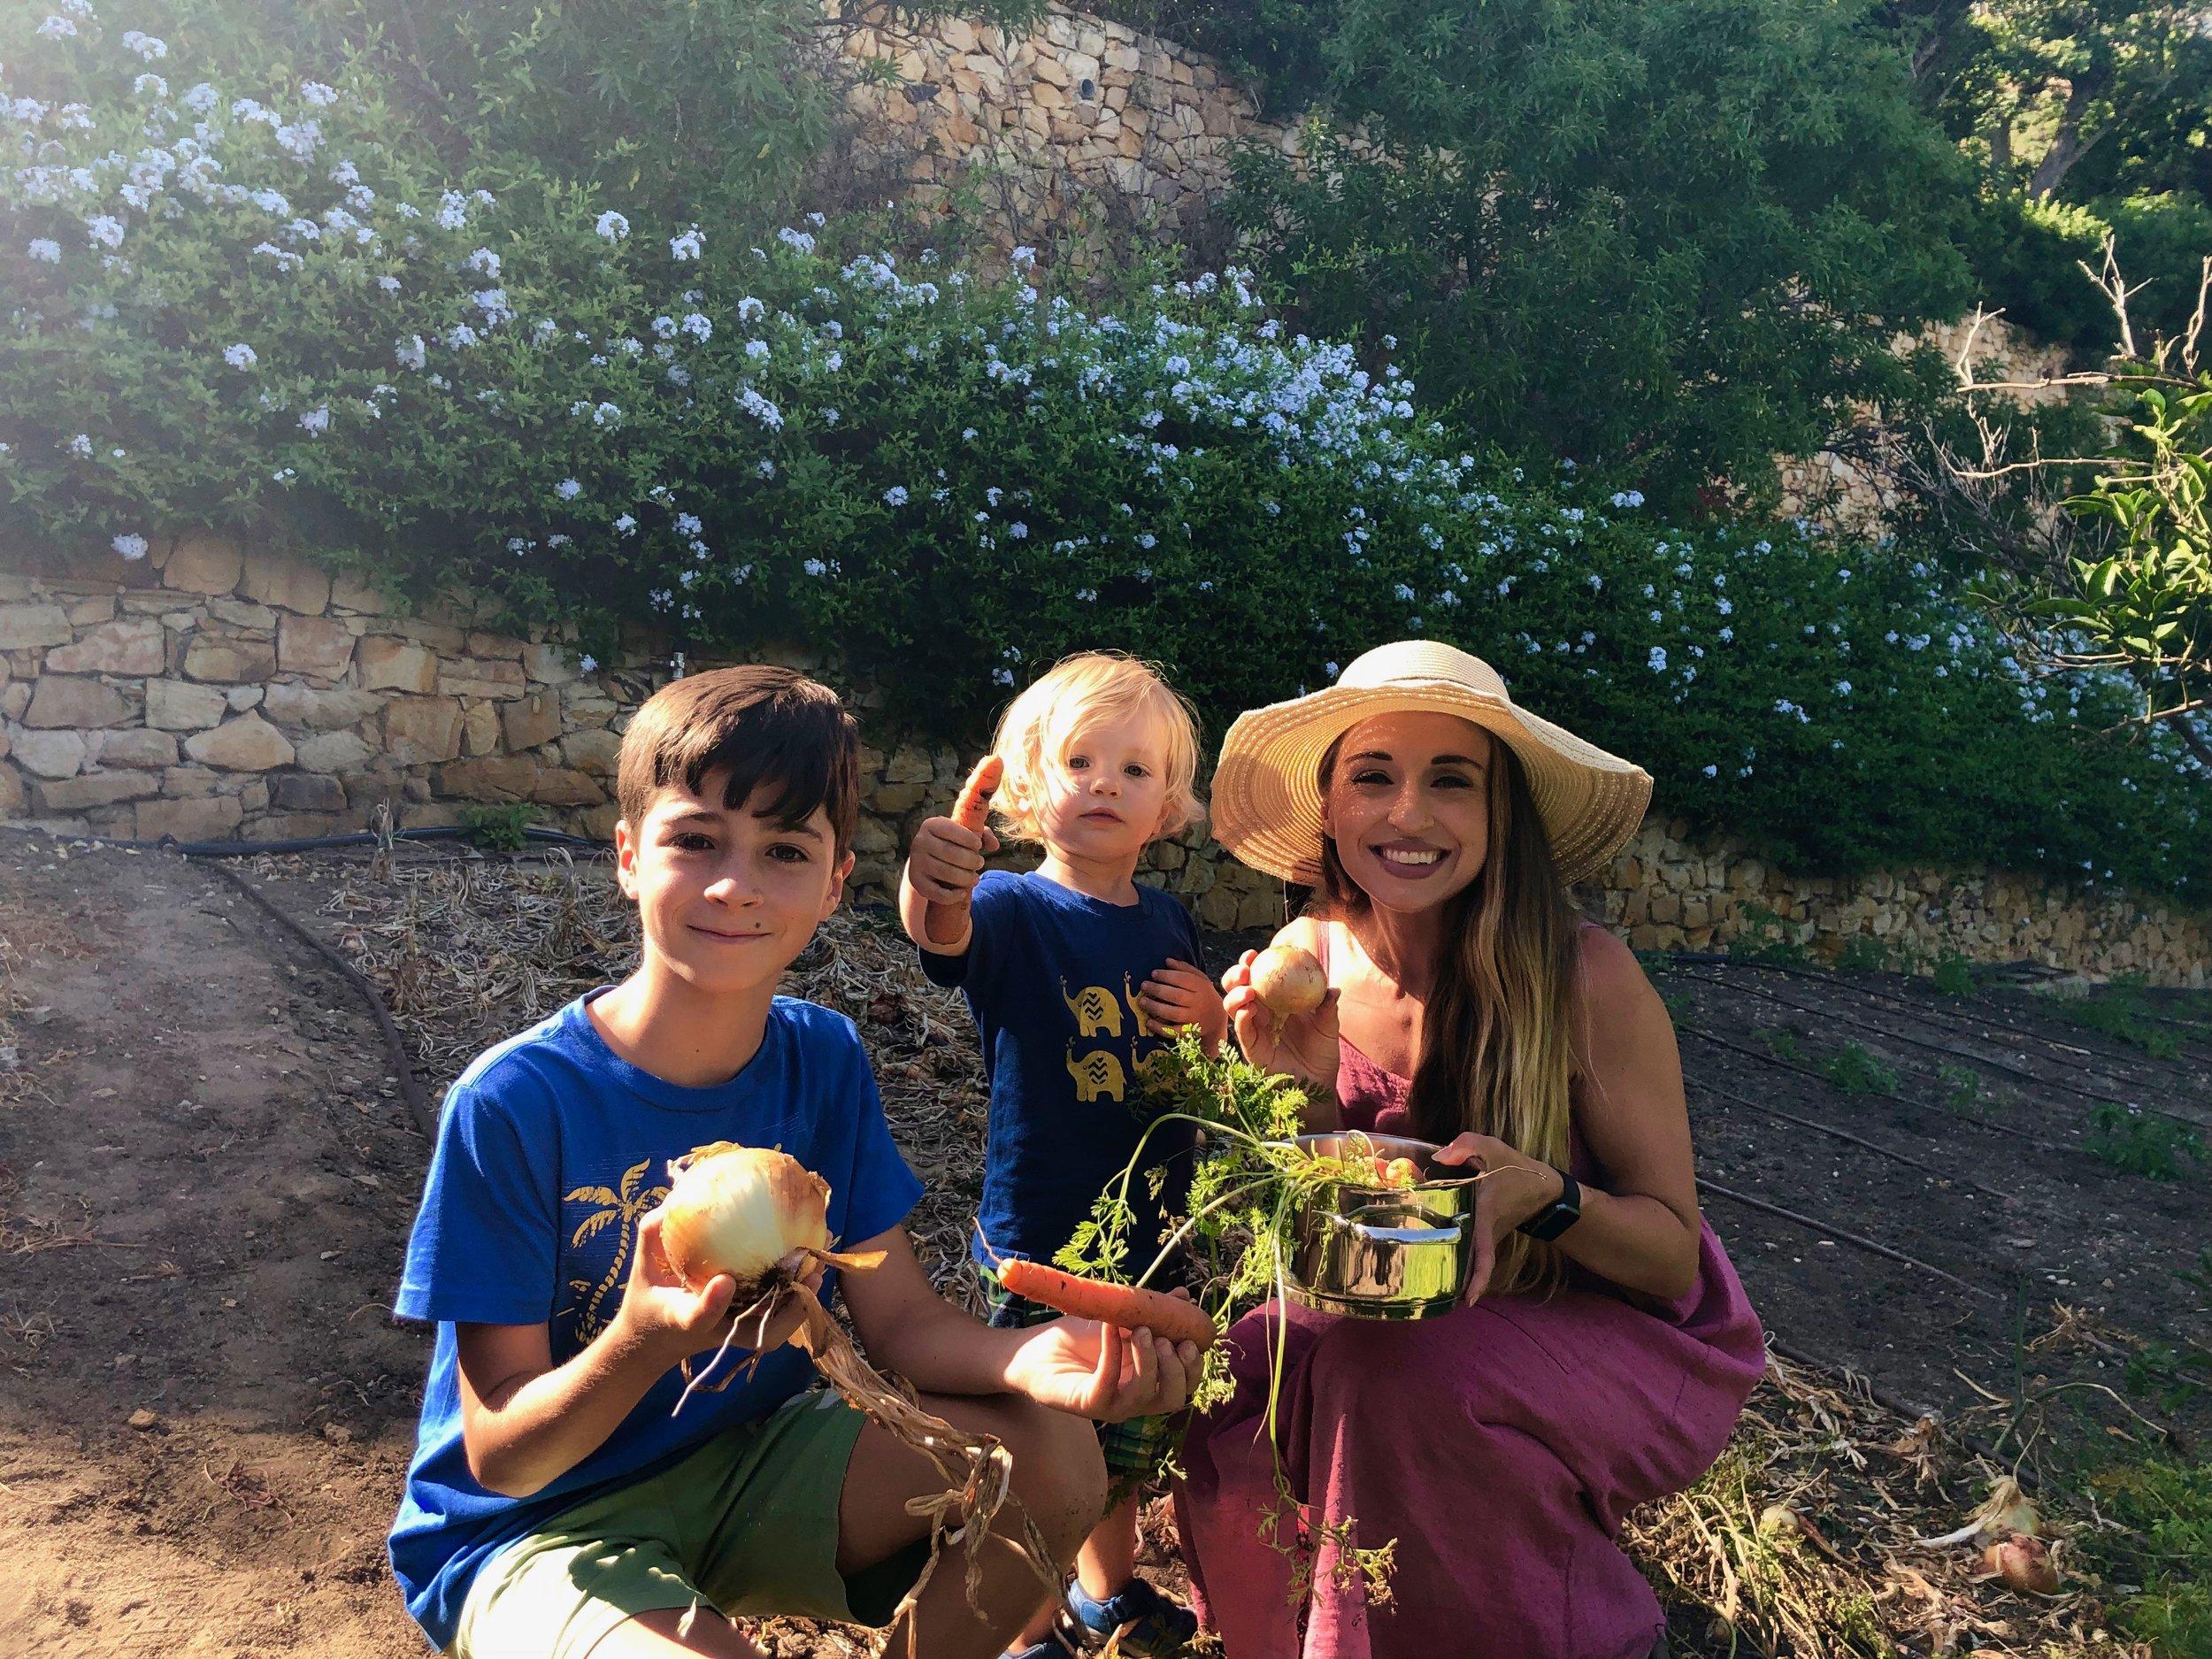 Nico, Jimmy, and Mikelle, in the garden area at La Finca Guatavita.